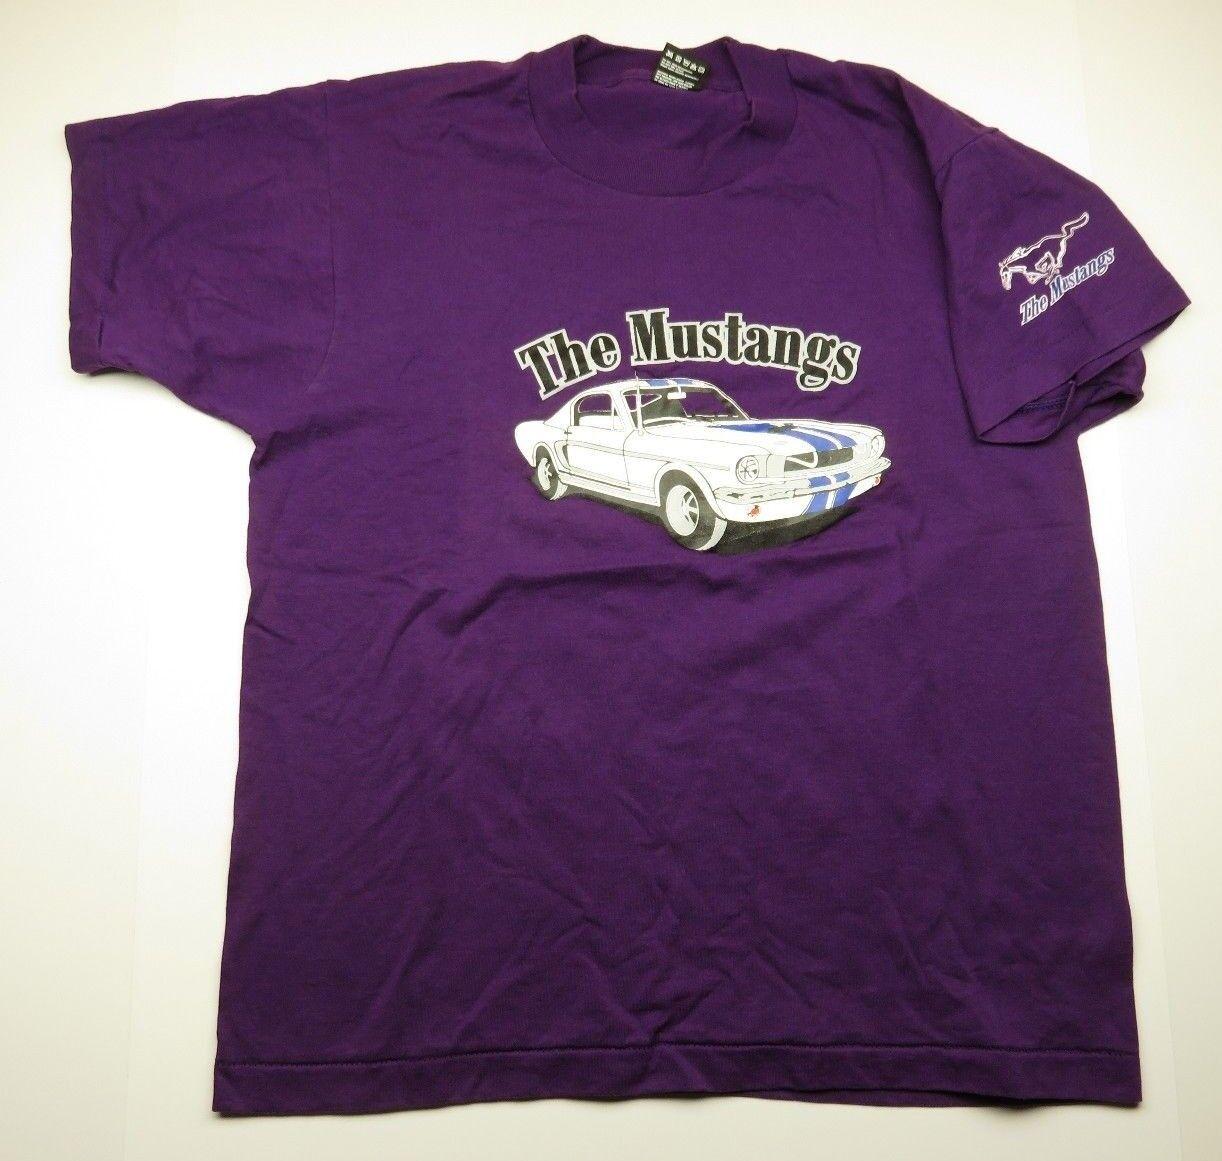 80s Retro The MUSTANGS Car & Horse Graphic Purple T-Shirt Adult Men's Size Large